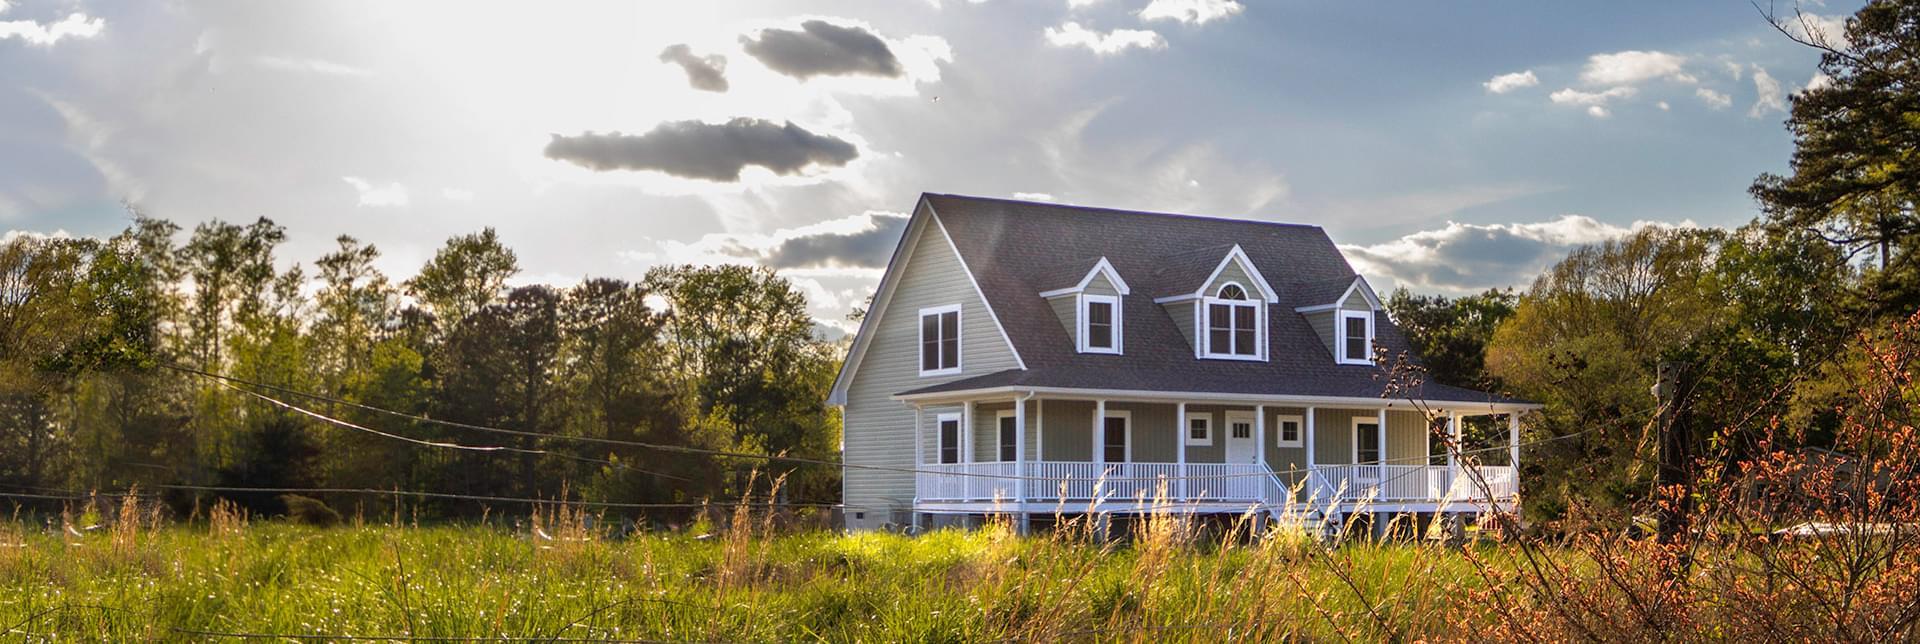 New Homes in Pasquotank County NC